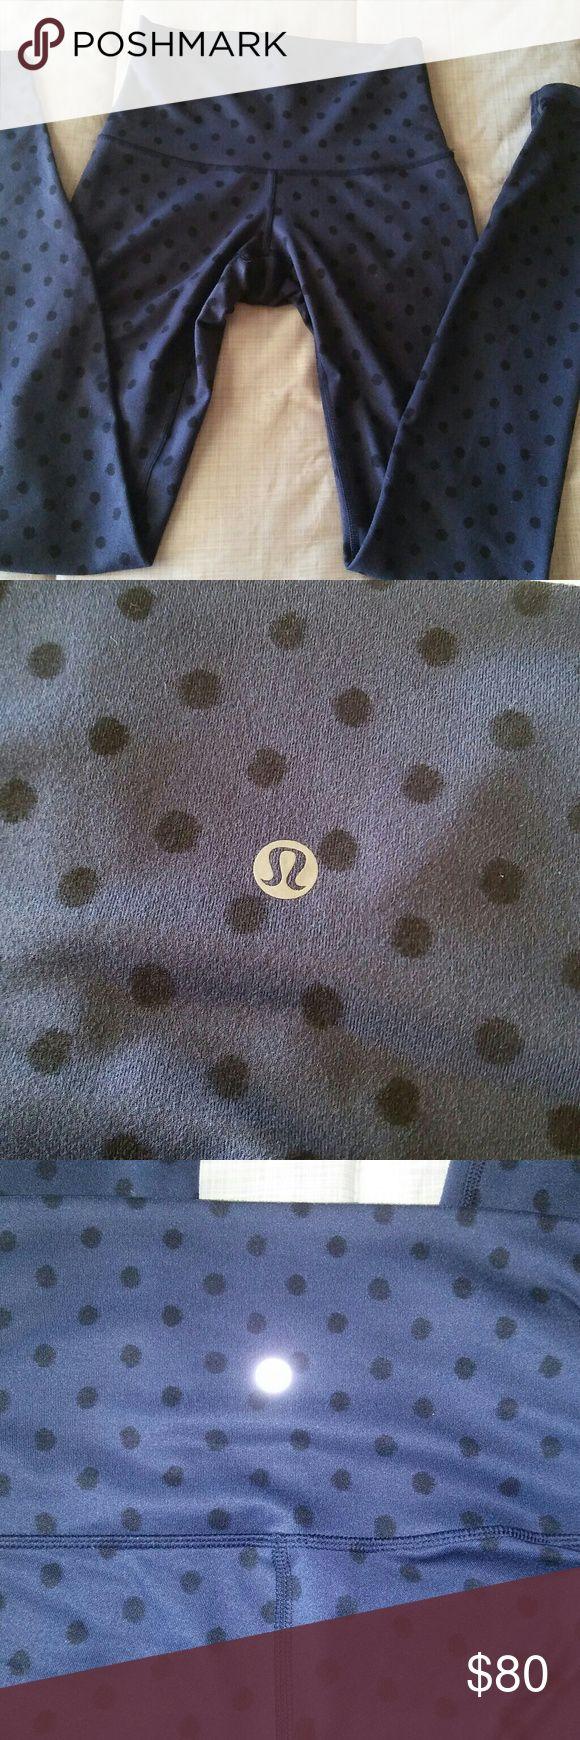 SALE 🚨Rare LULULEMON wunder under Perfect condition. No pilling, stains or holes. Size 4 Long length Mid rise lululemon athletica Pants Leggings